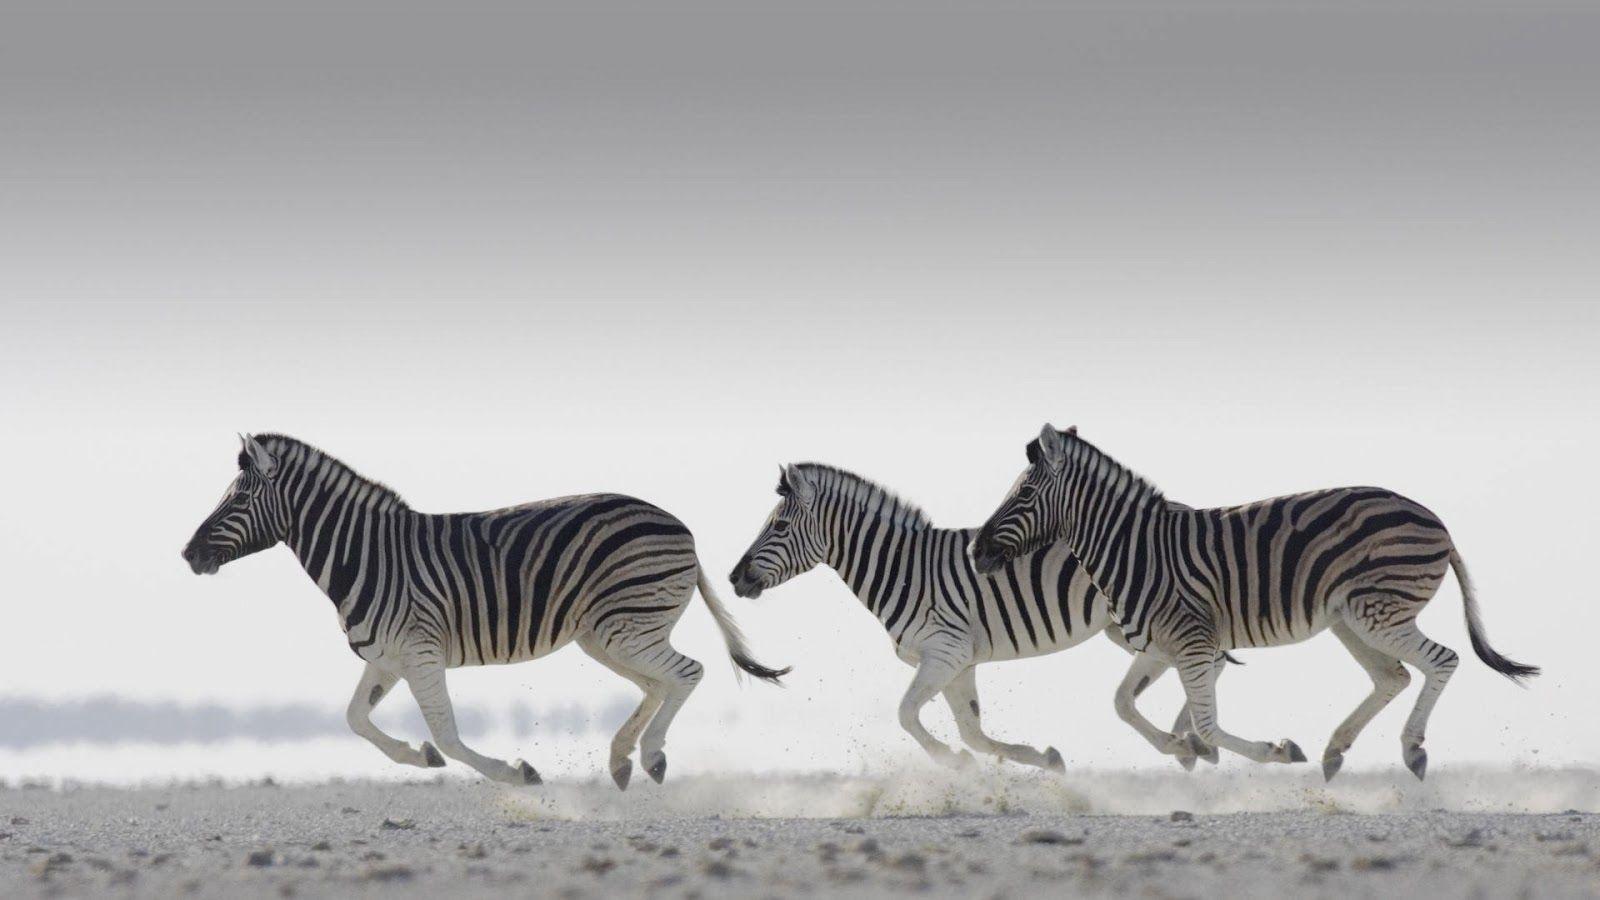 Zebra Delectable Hd Wallpaper Download Zebra Wallpaper Zebra